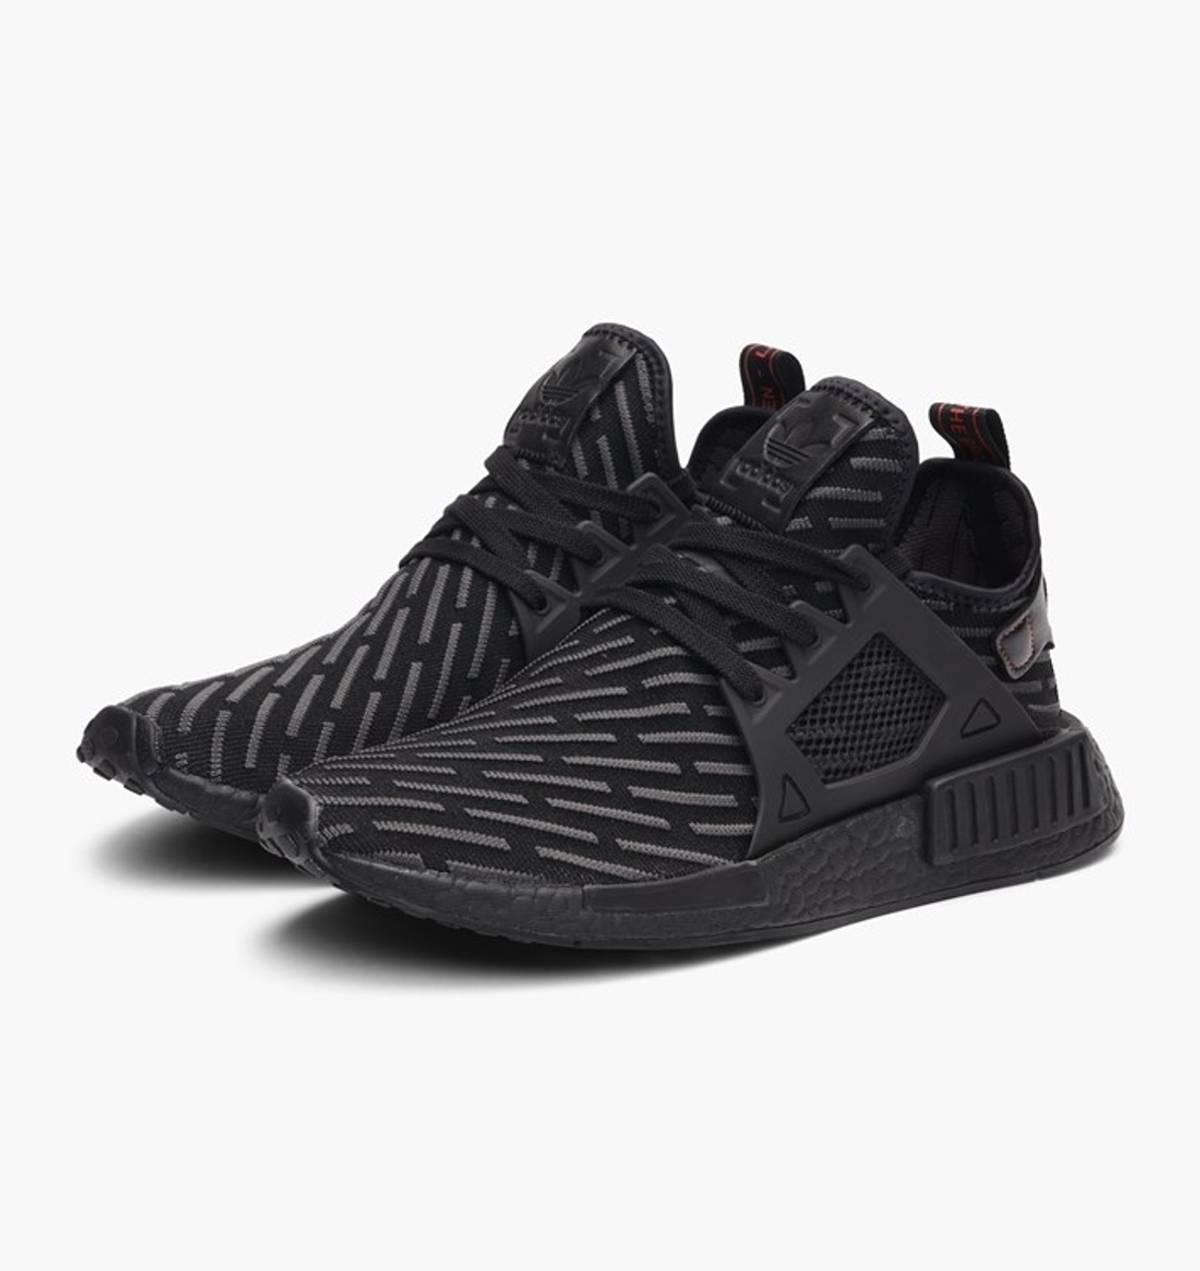 Adidas Adidas Nmd Xr1 Triple Black Grailed